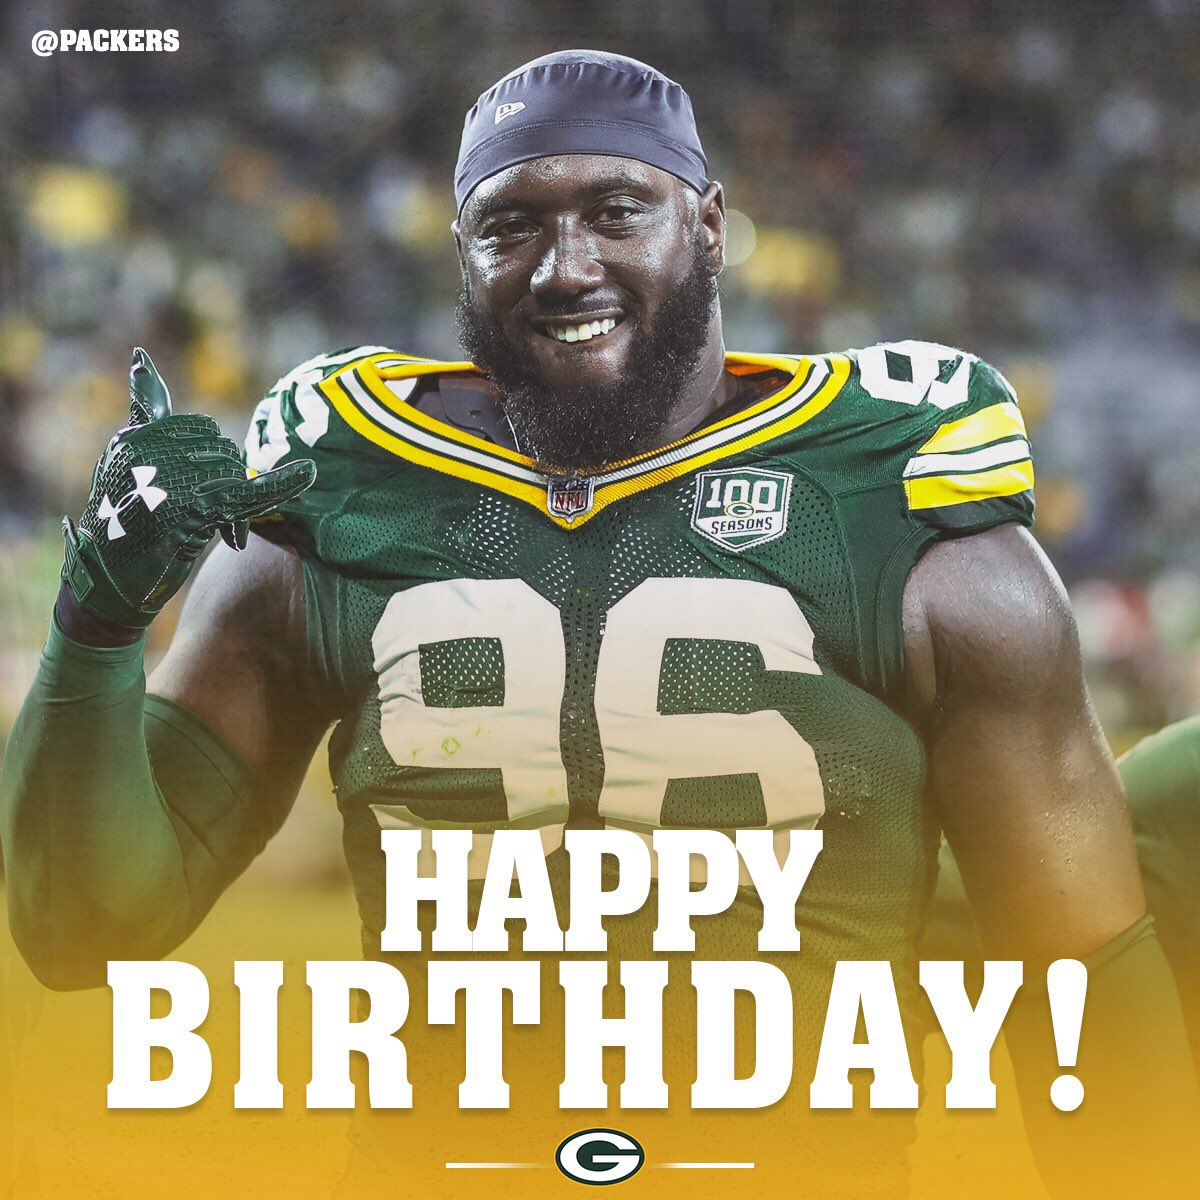 Happy birthday, @mowilkerson! 🎉